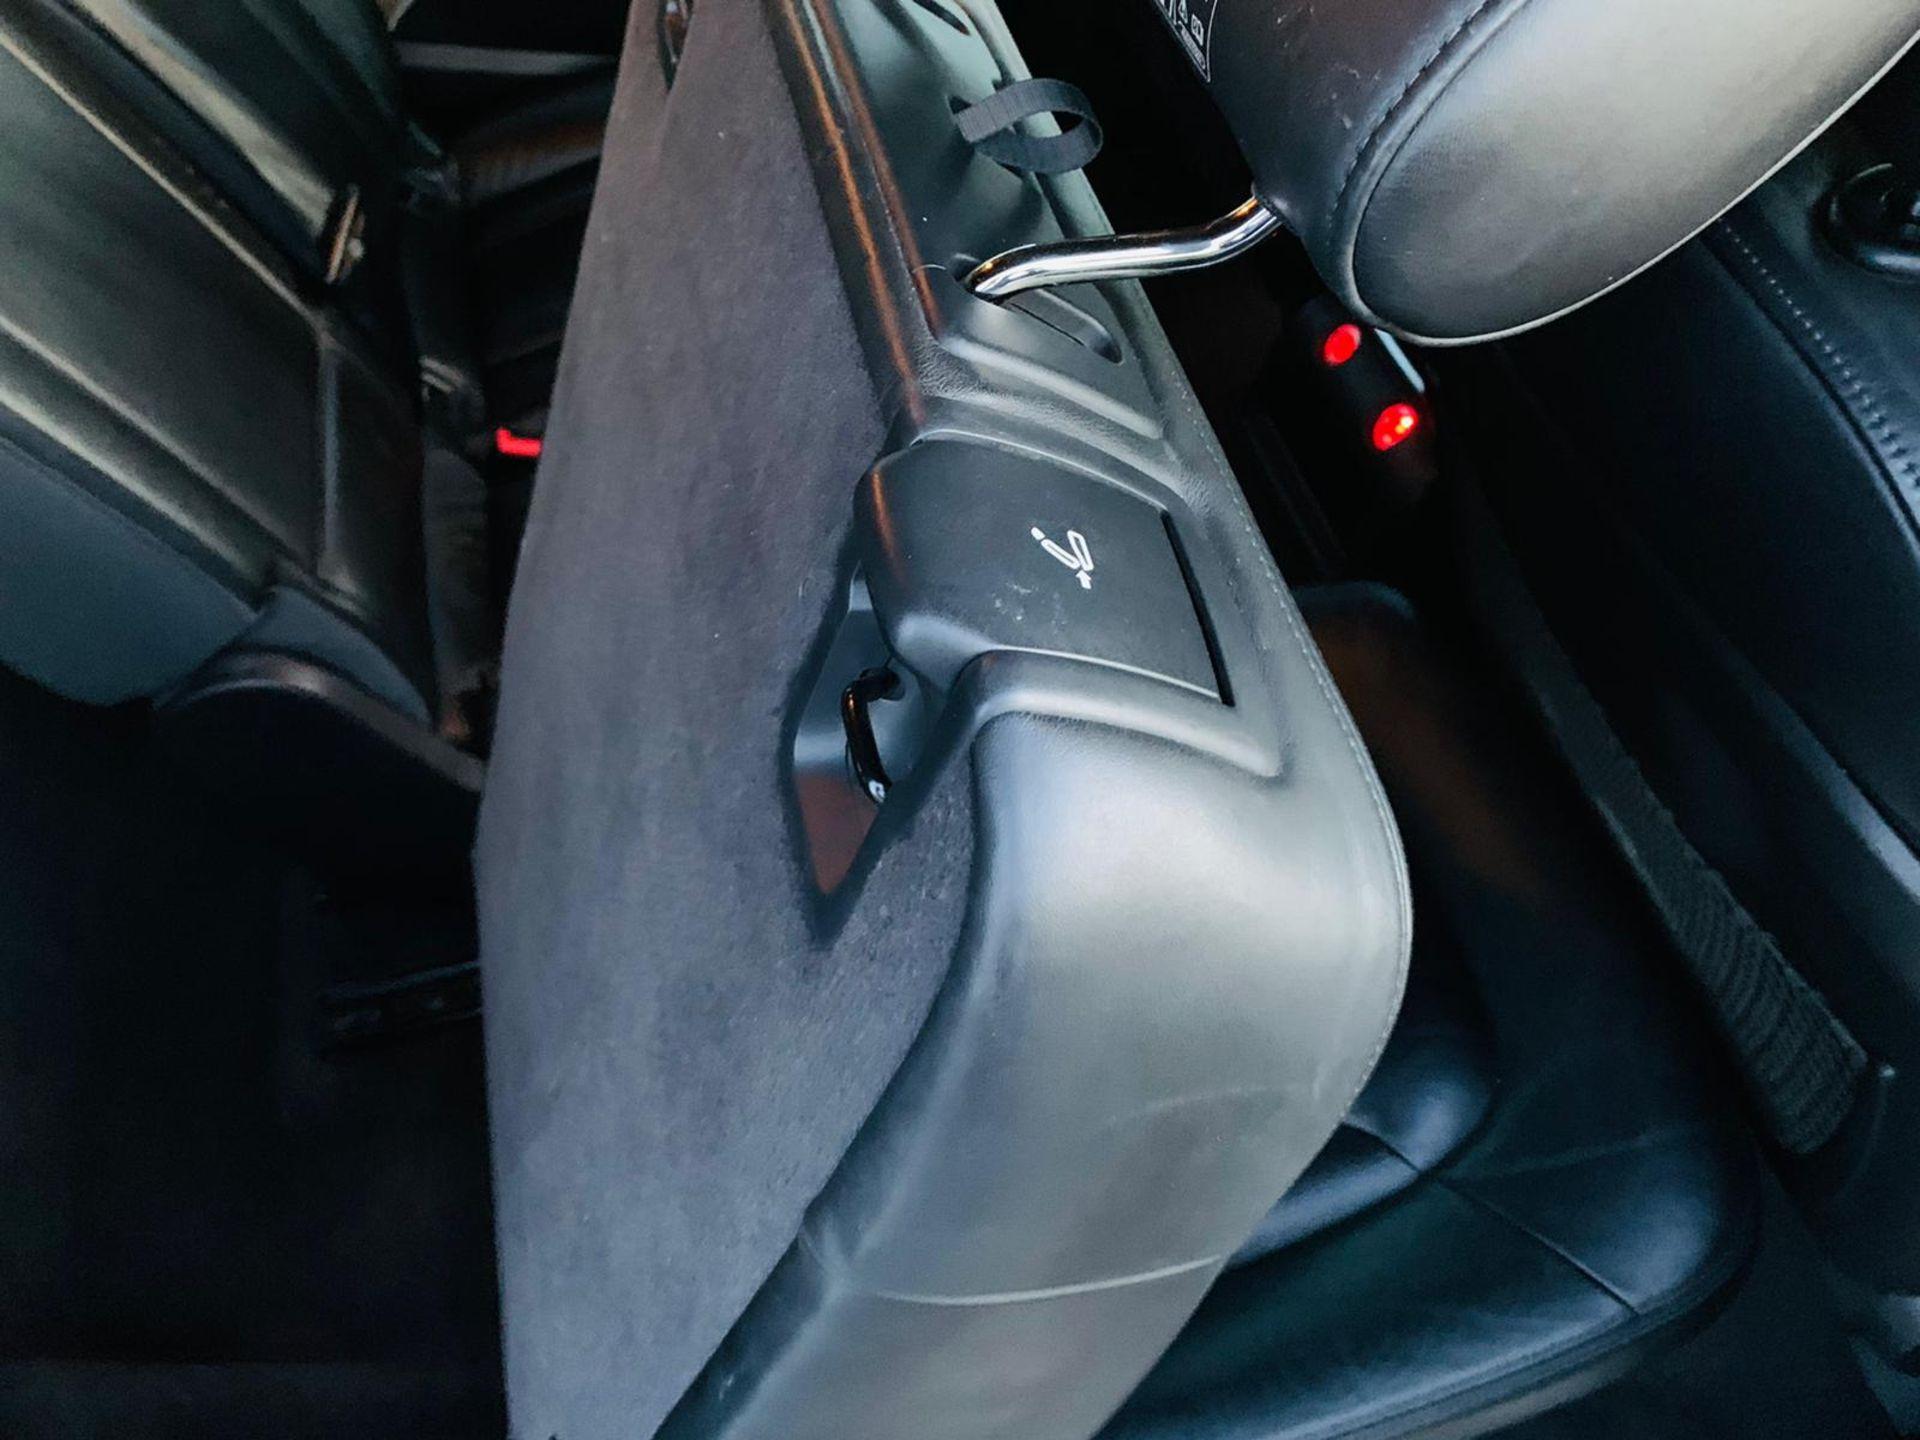 (Reserve Met)Audi Q7 3.0 TDI Quattro S Line Plus Auto (7 Seats) - 12 Reg - Only 63k Miles -Sat Nav- - Image 34 of 37